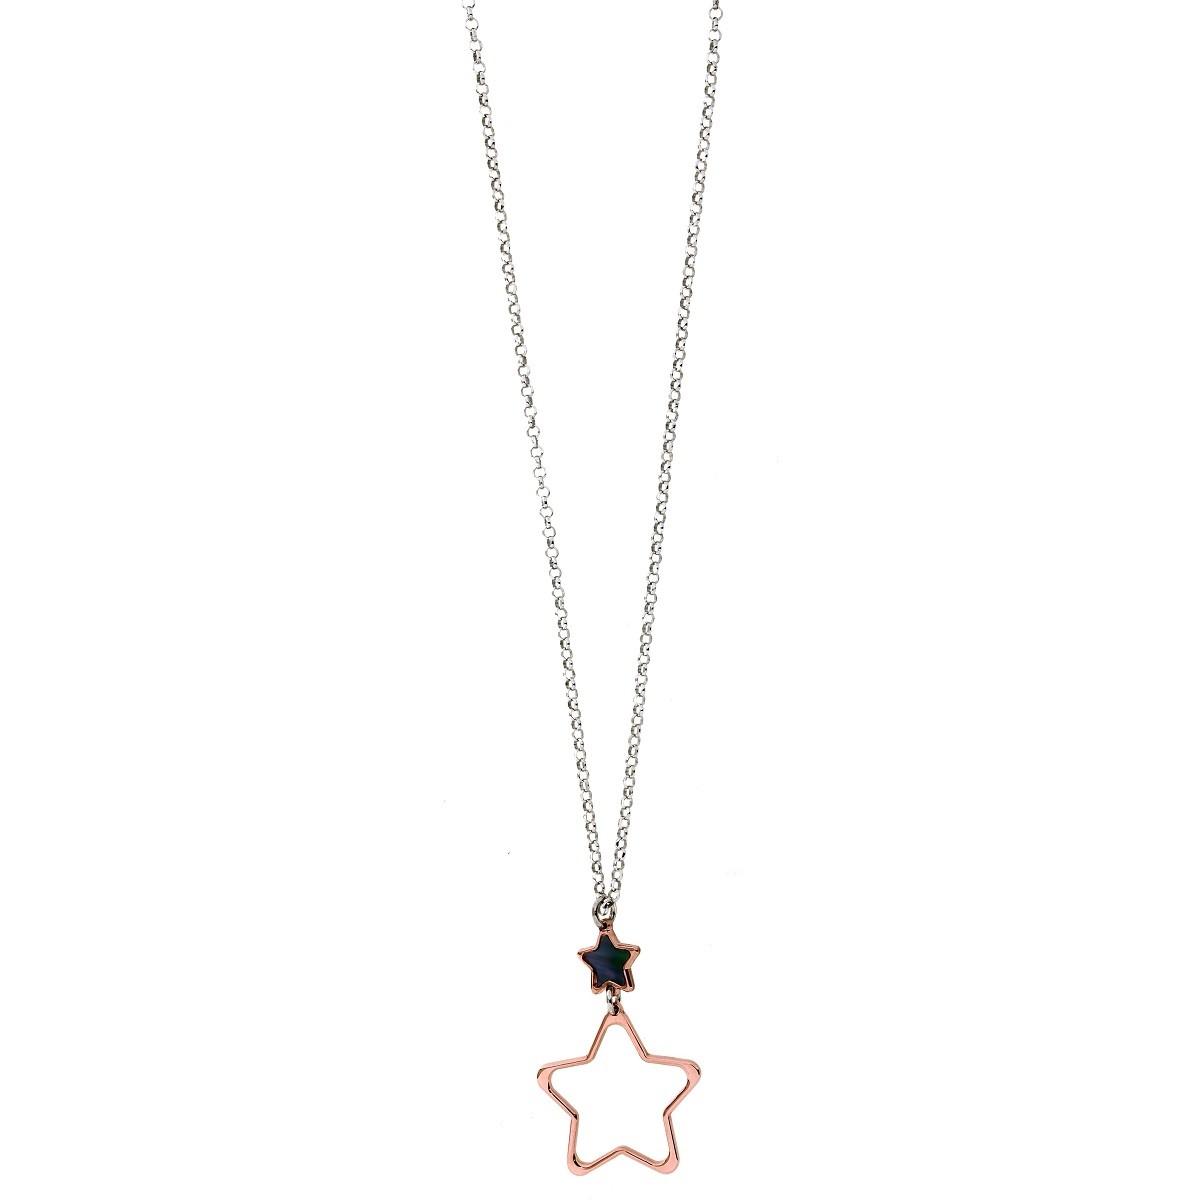 ce7434fd74 Γυναικεια Κοσμηματα Ασημένιο Κολιέ Verita. True Luxury 10425385